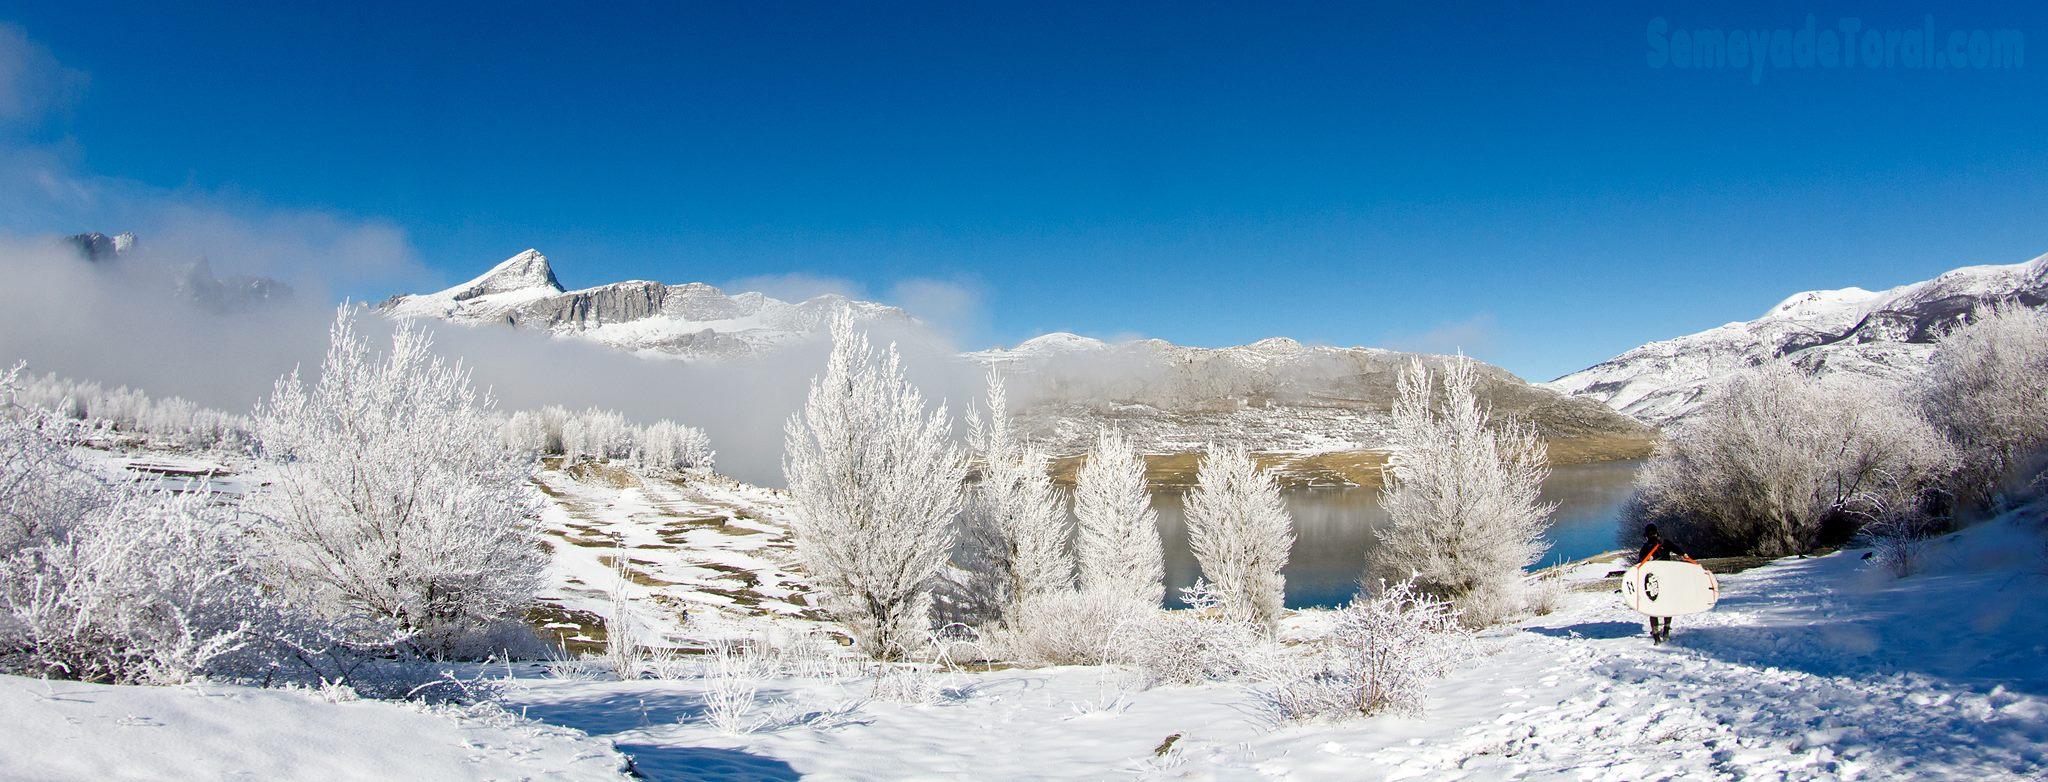 Riaño congelado - PANORÁMICAS - Semeya  de Toral